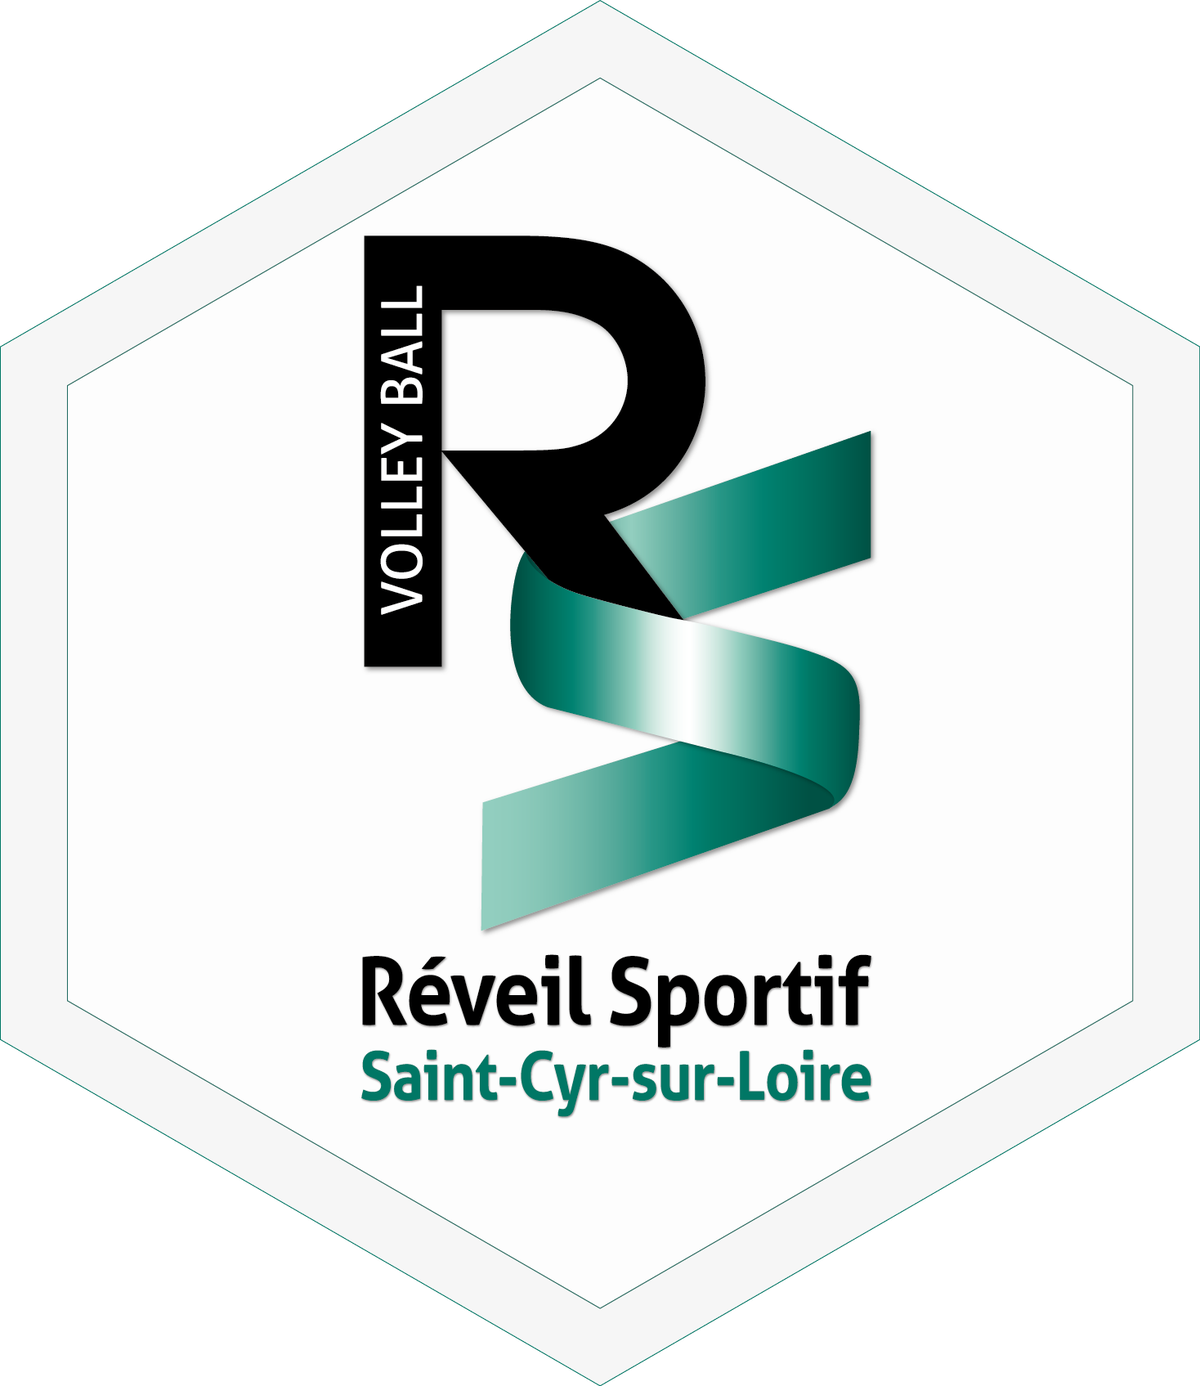 Reveil Sportif Saint Cyr Volley Ball Site Officiel Du Club De